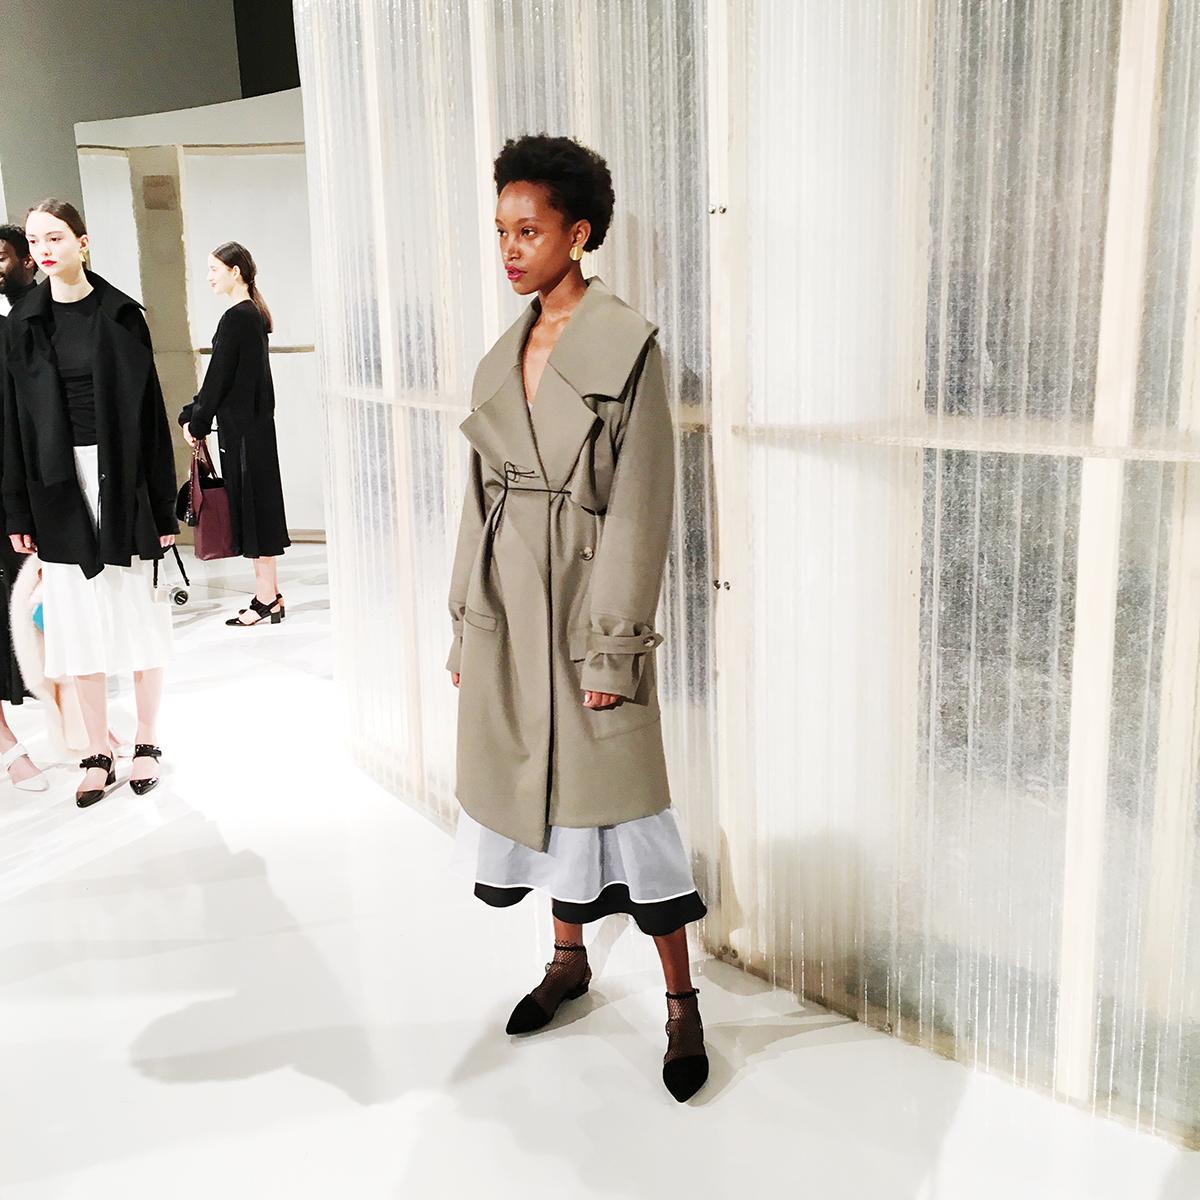 Malaikaraiss / Fashionweek Berlin / Foxycheeks